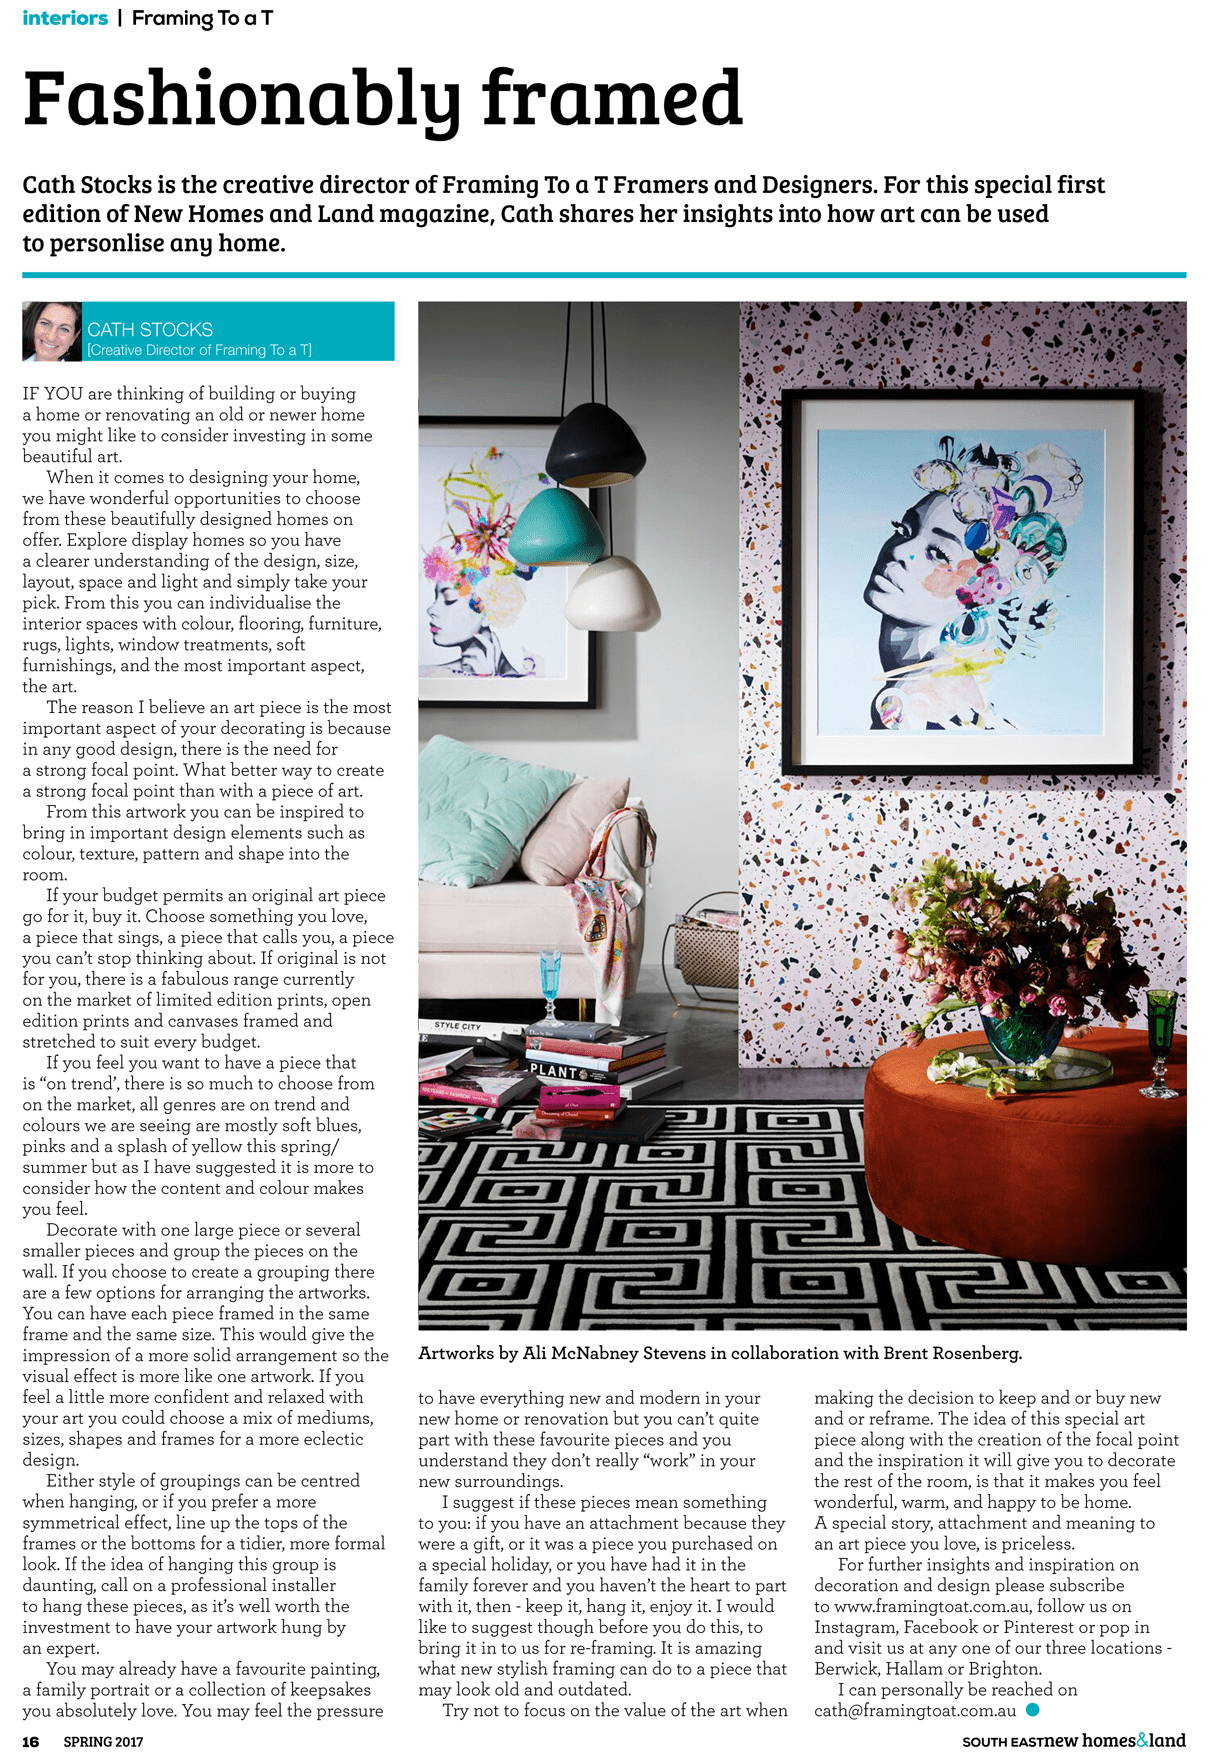 The Block Magazine Inside Spread